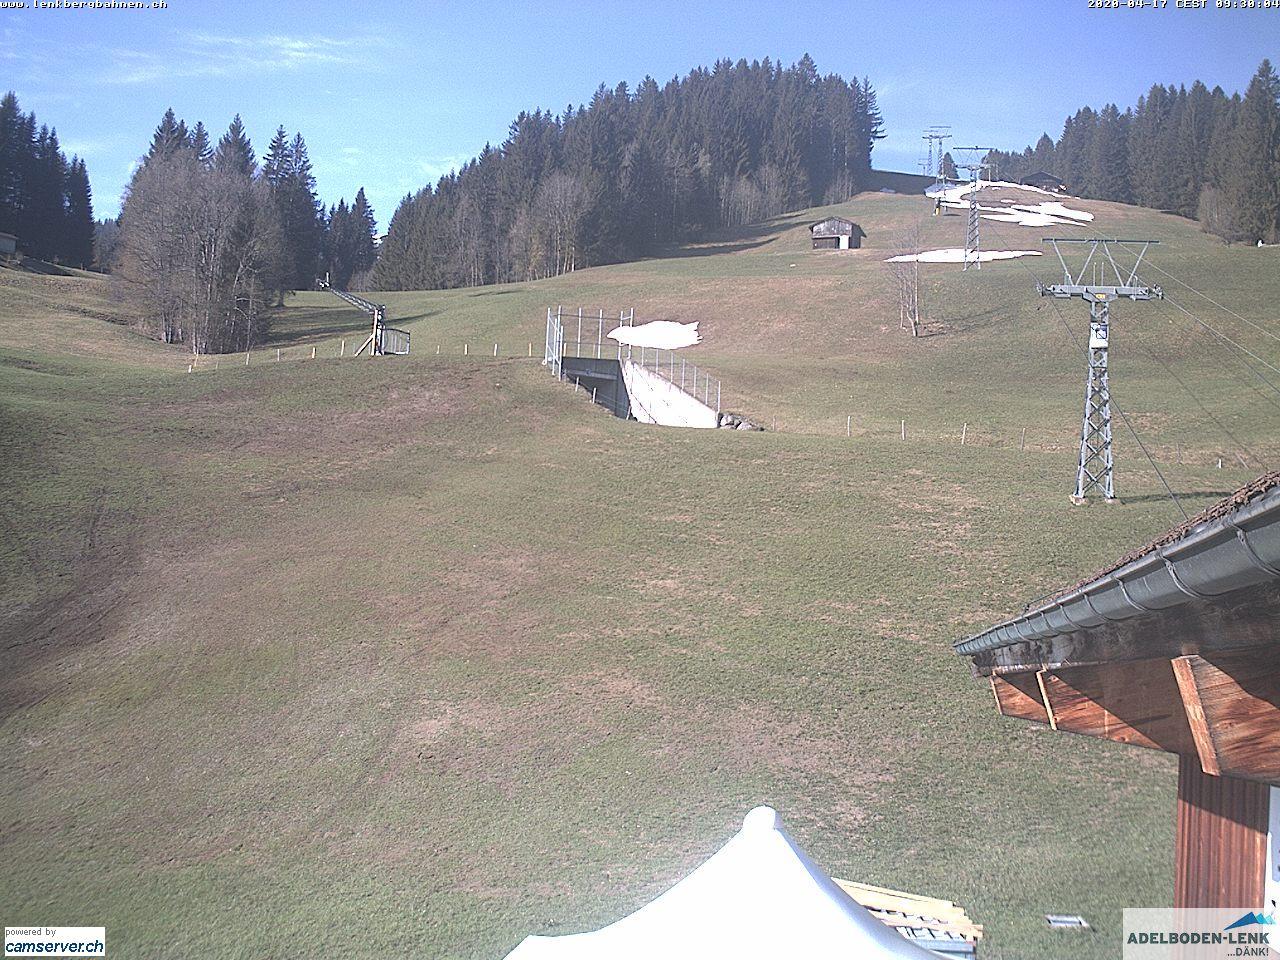 Webcam de la Estación de Esquí de Adelboden / Lenk